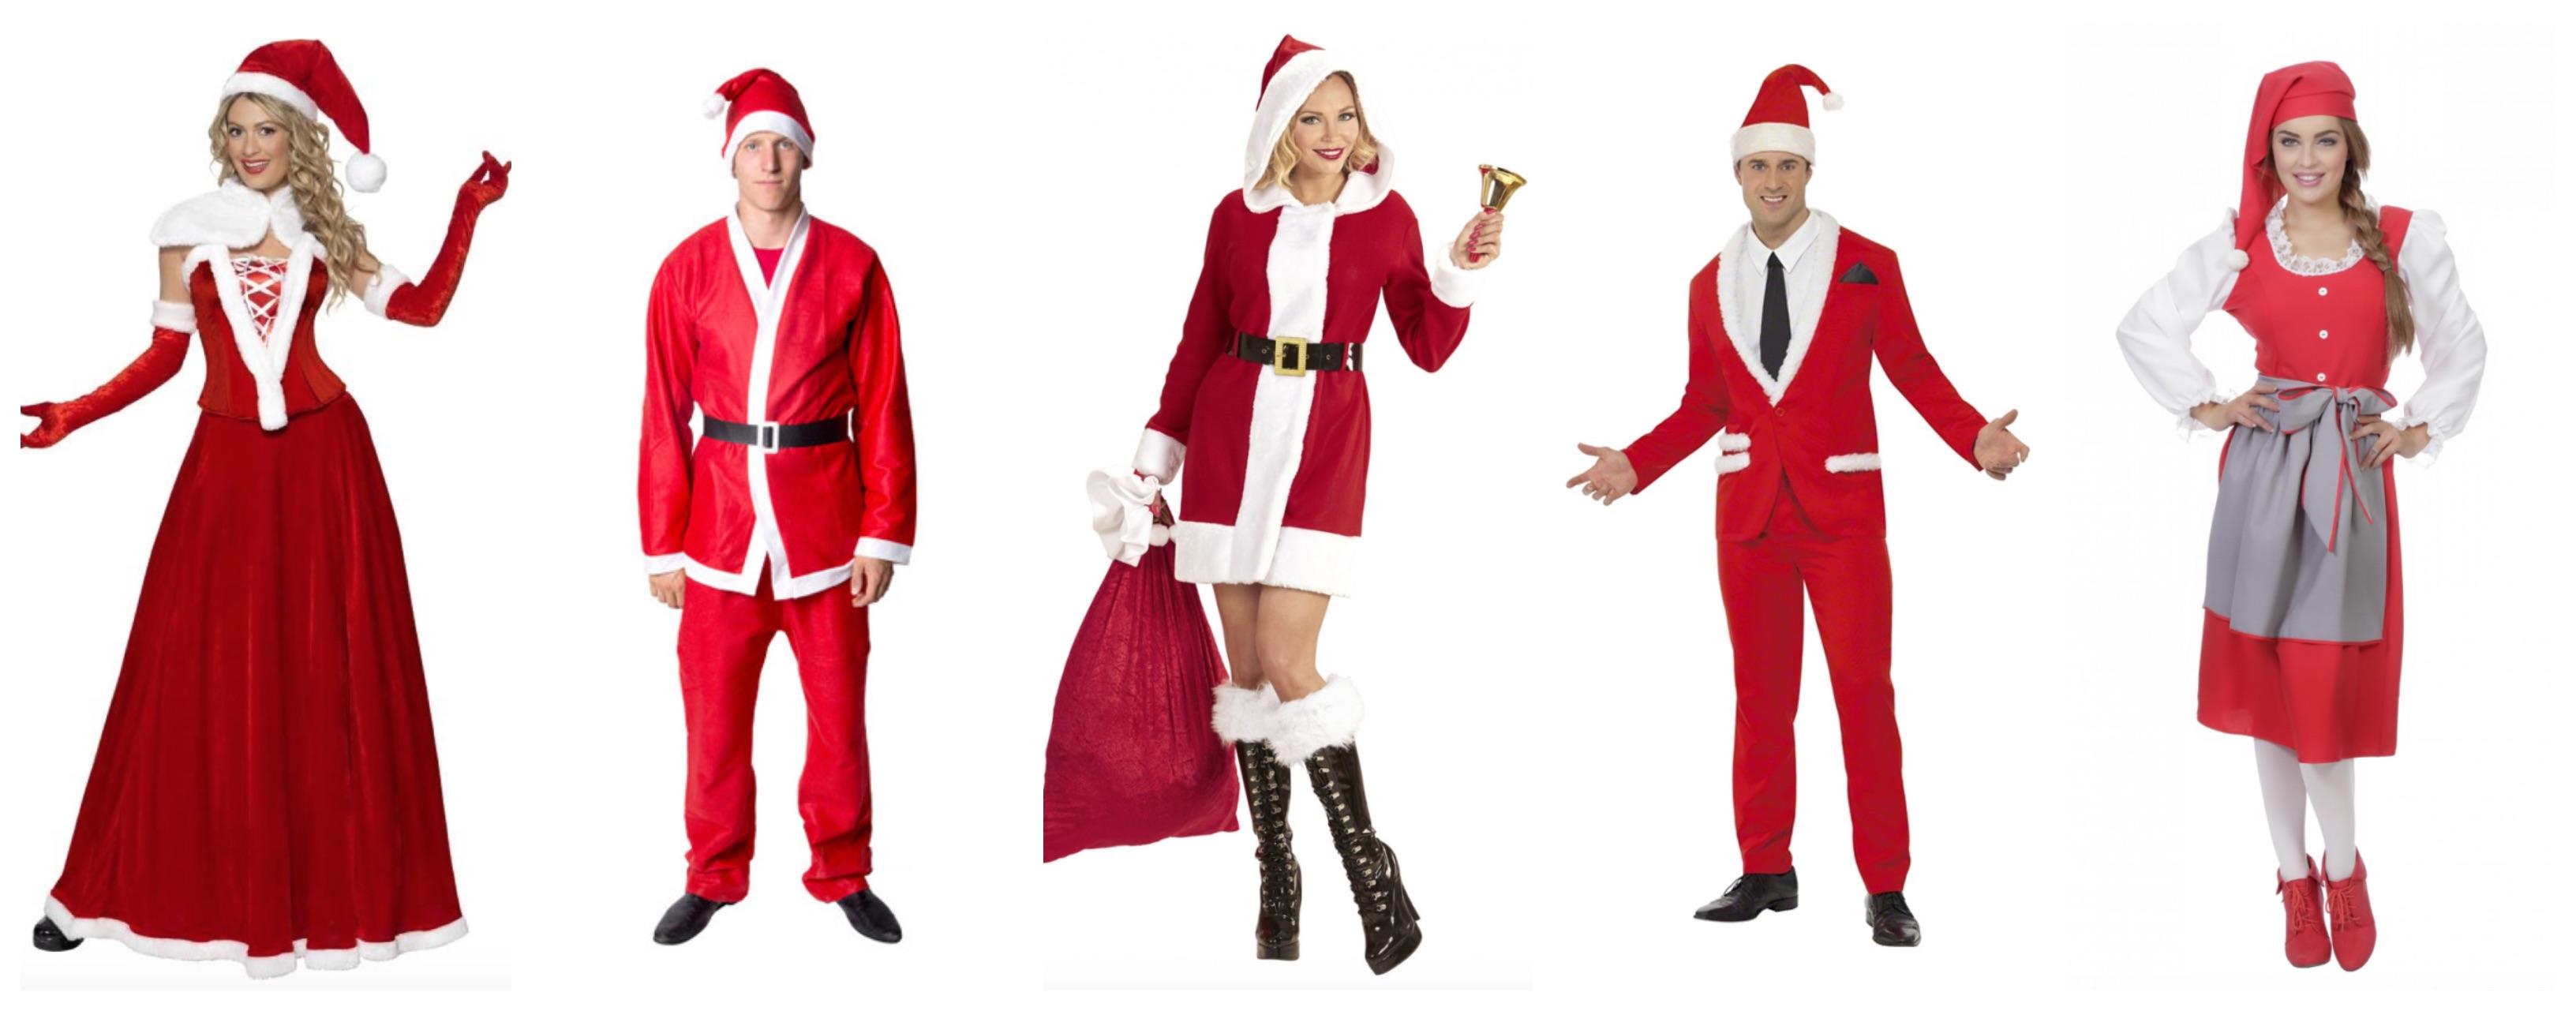 nisse kostume til voksne - Nisse kostume til voksne